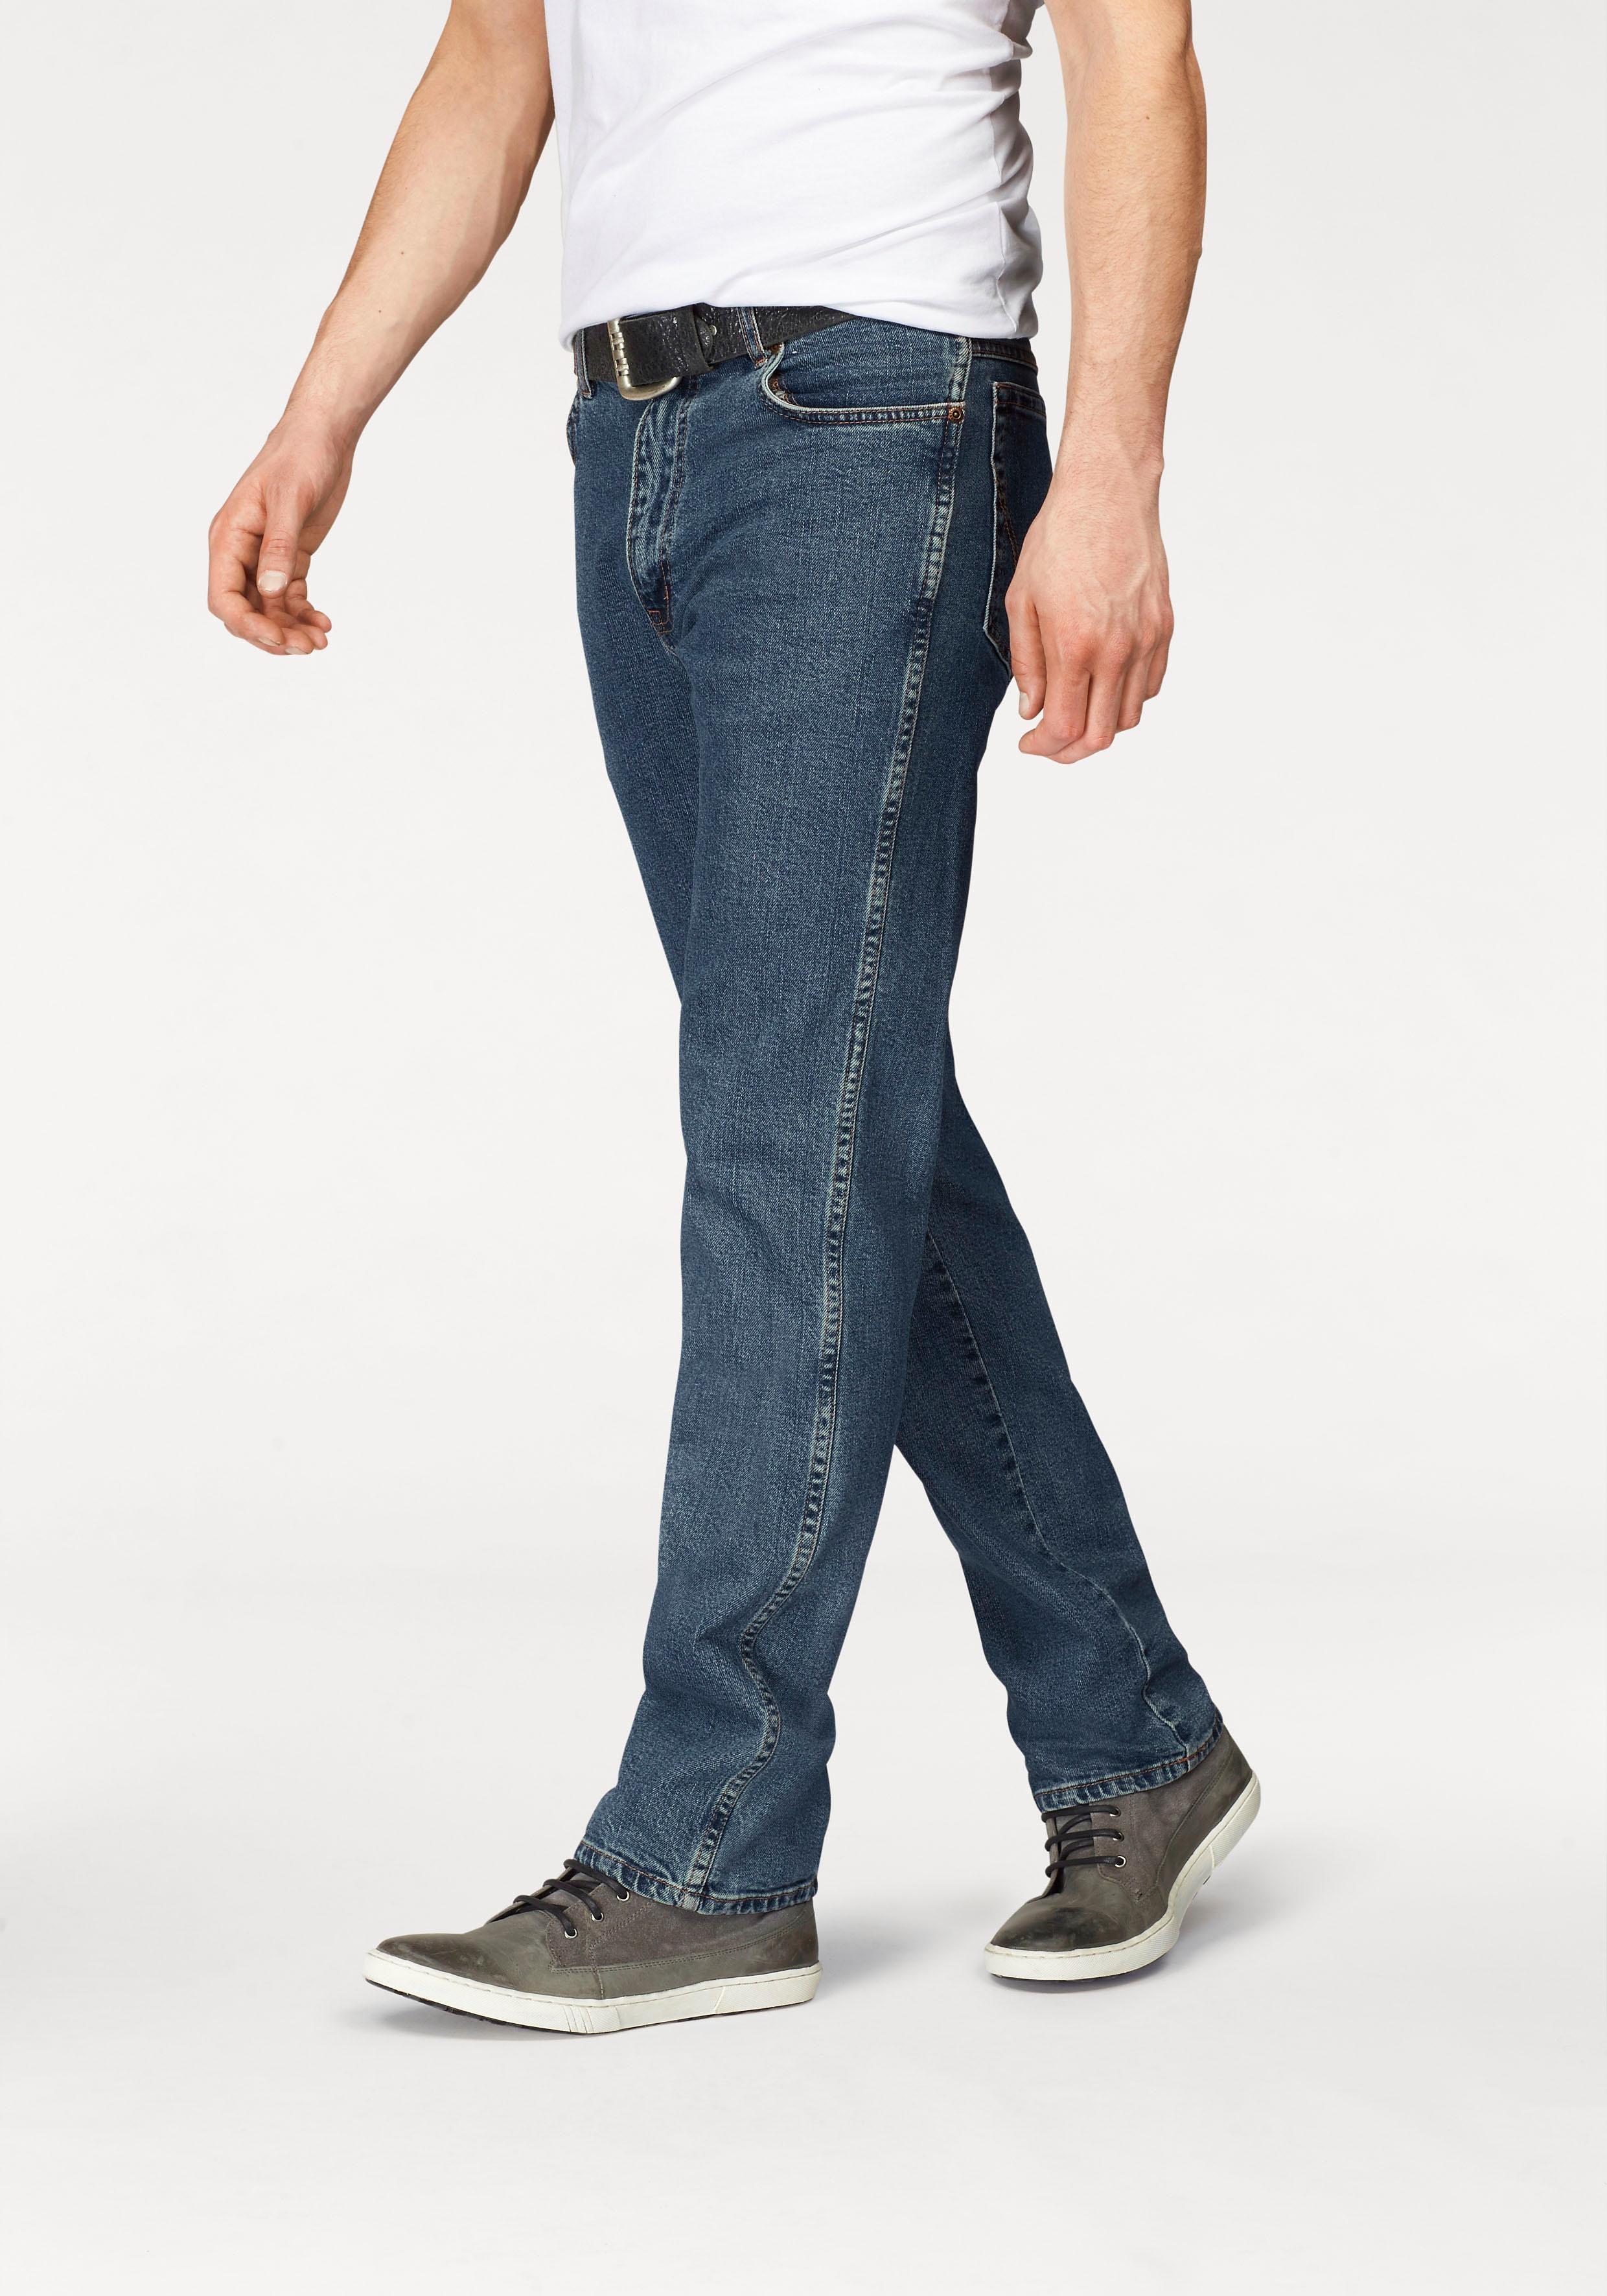 Wrangler Stretch-Jeans Durable   Bekleidung > Jeans > Sonstige Jeans   Blau   Wrangler